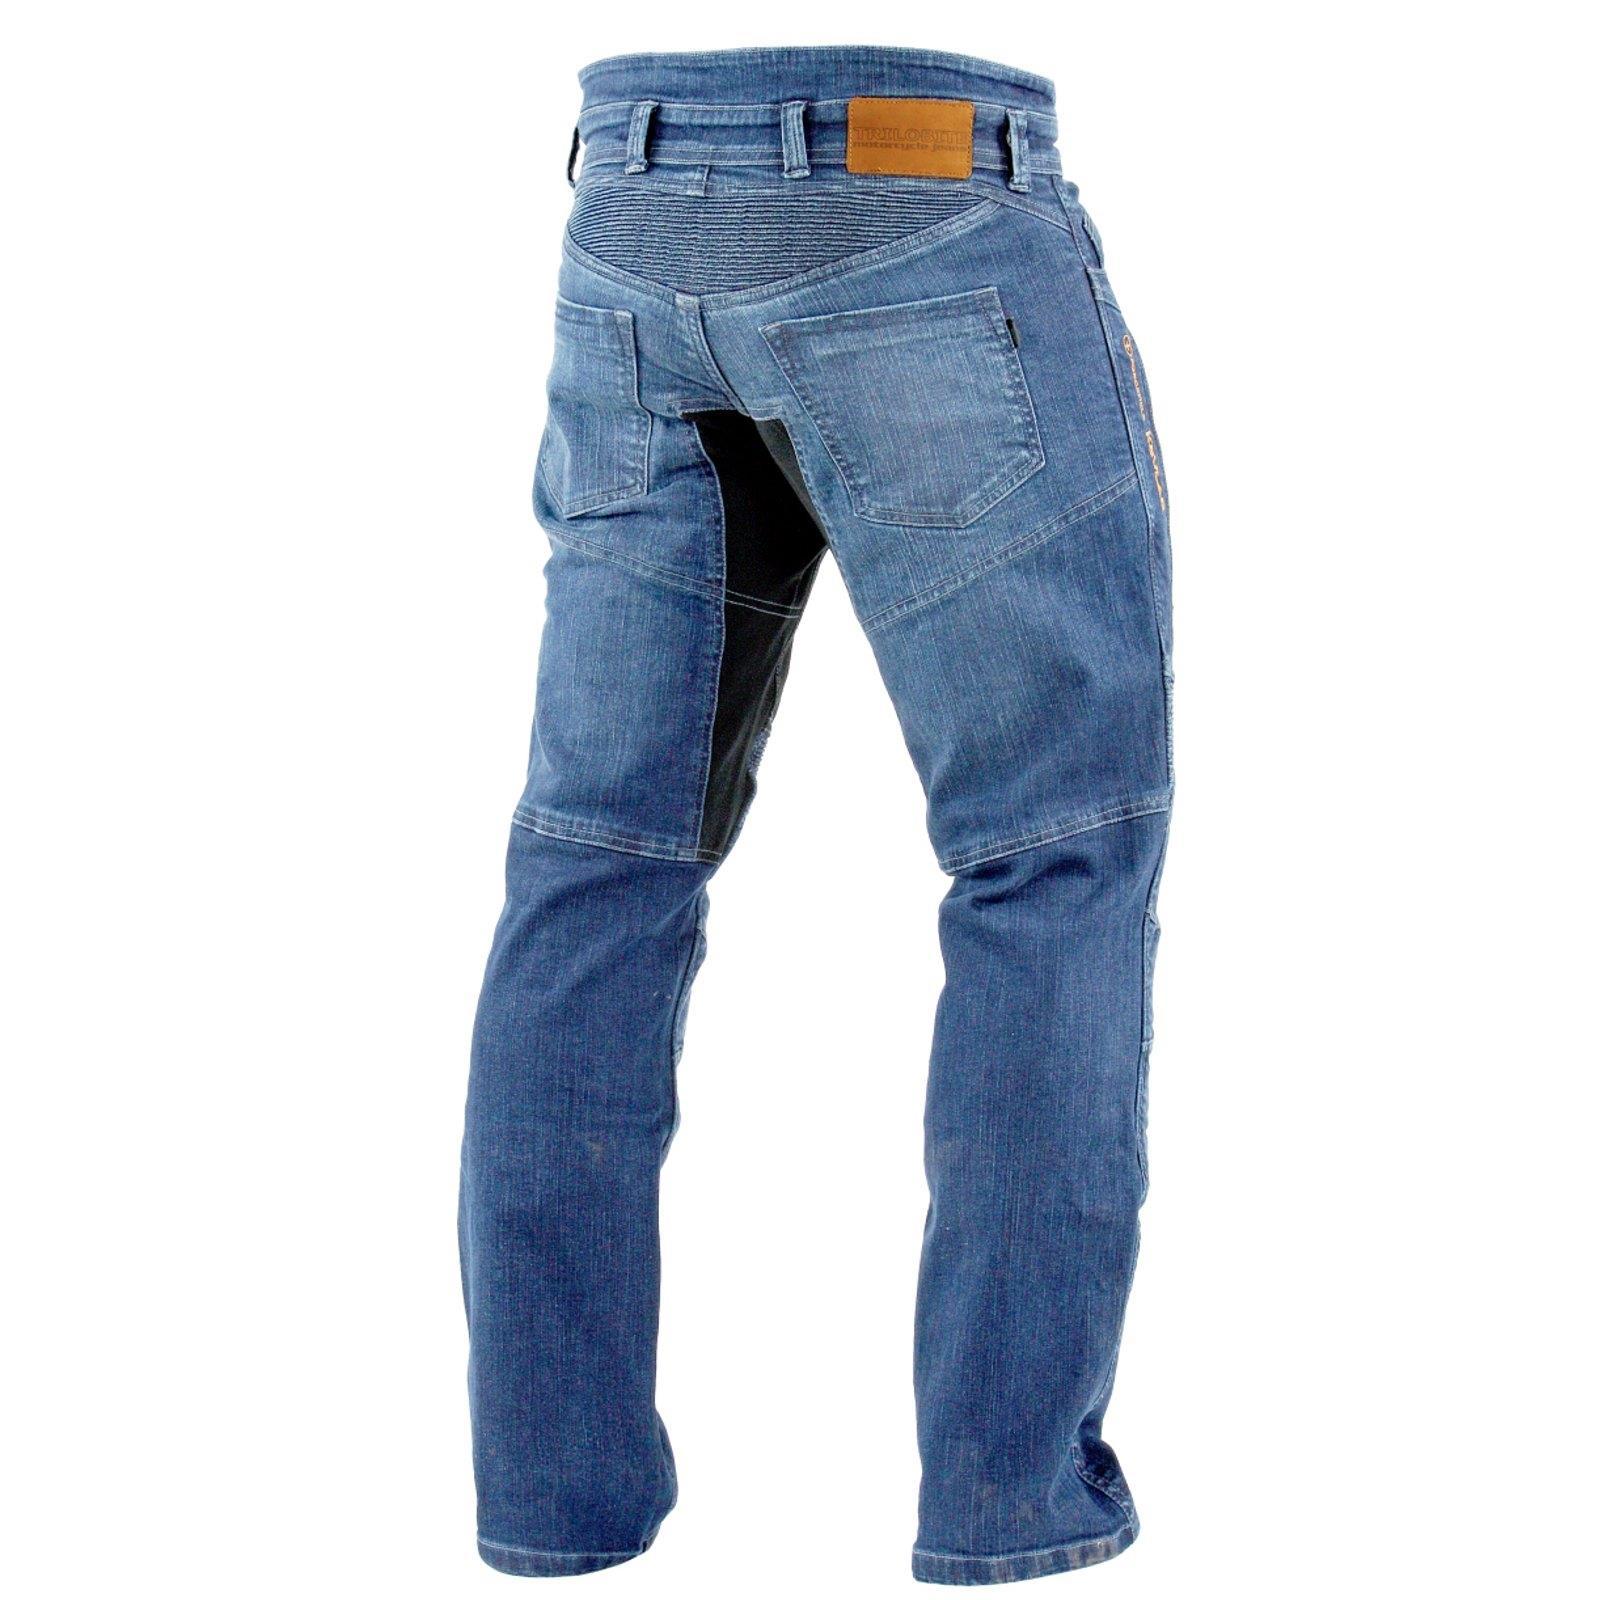 trilobite parado jacke hose protektor inkl aramid motorrad jeans herren damen ebay. Black Bedroom Furniture Sets. Home Design Ideas